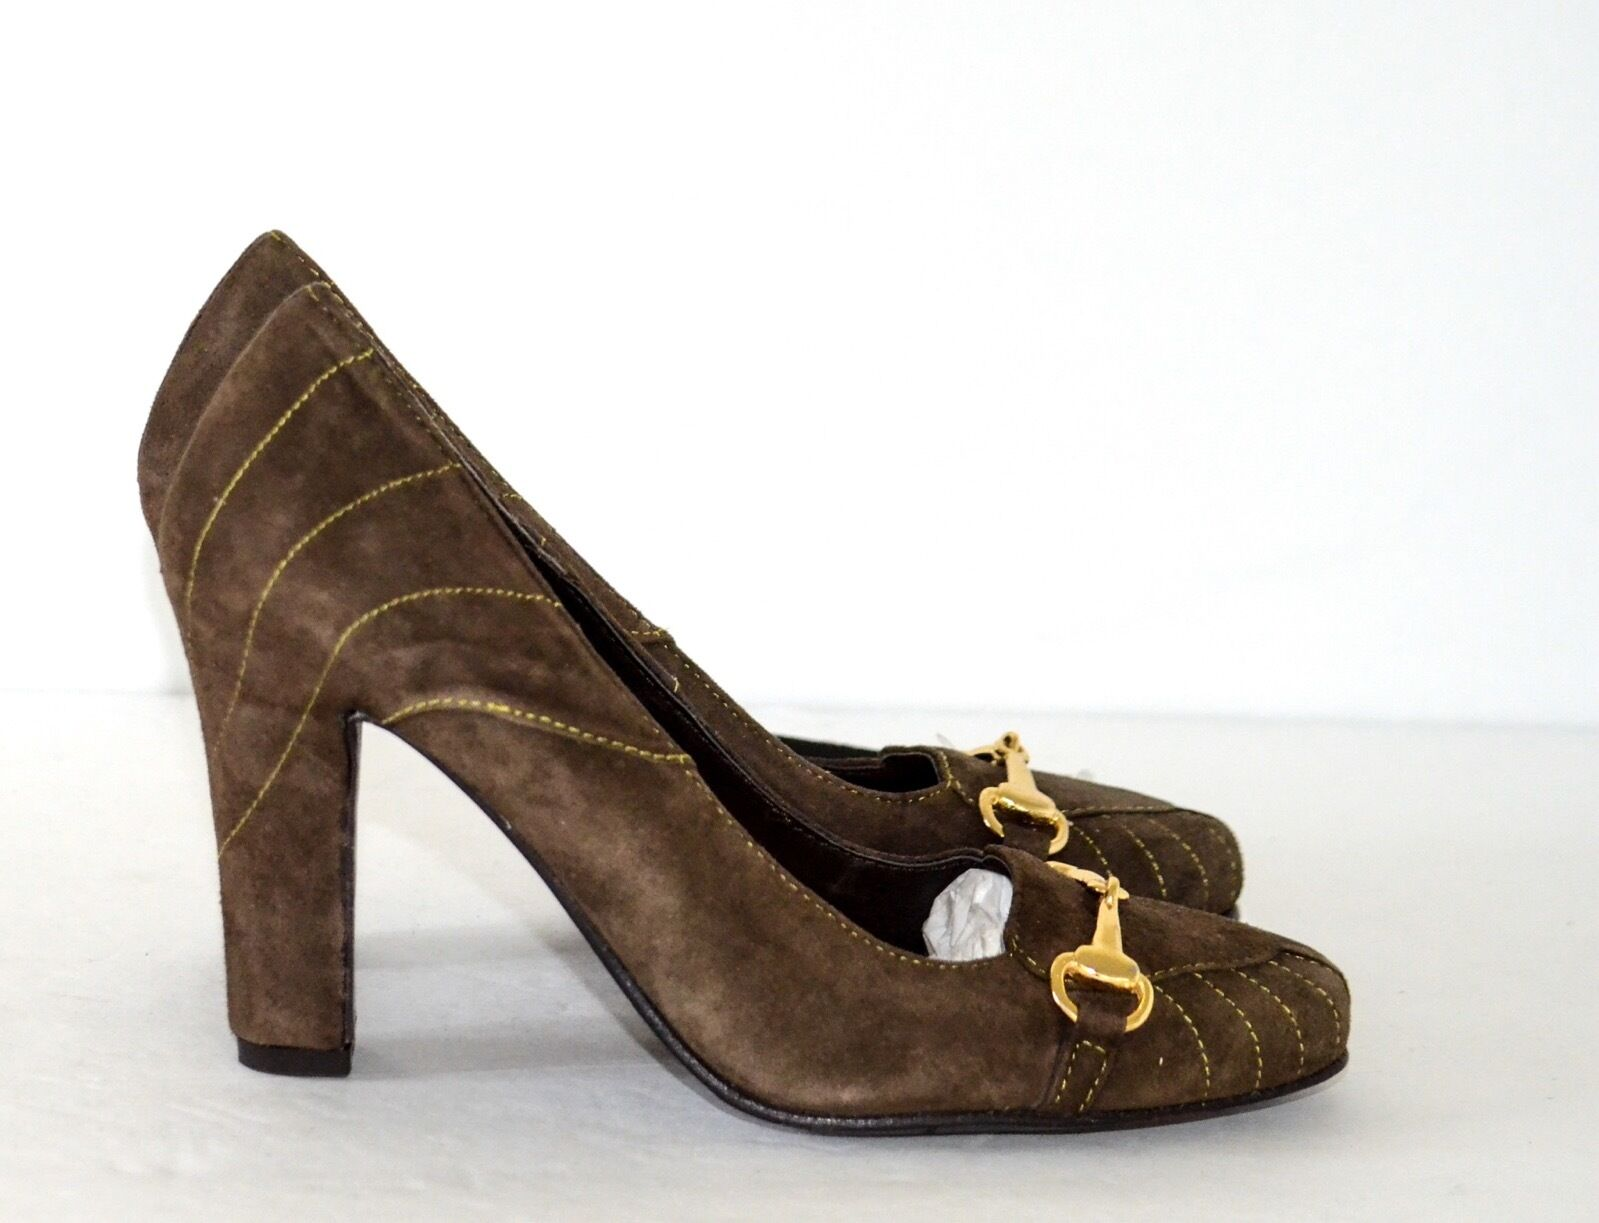 Sisley Donna's Nubuck Olive giallo Stitching Horsesbit  Pumps scarpe   Horsesbit 31ce7d